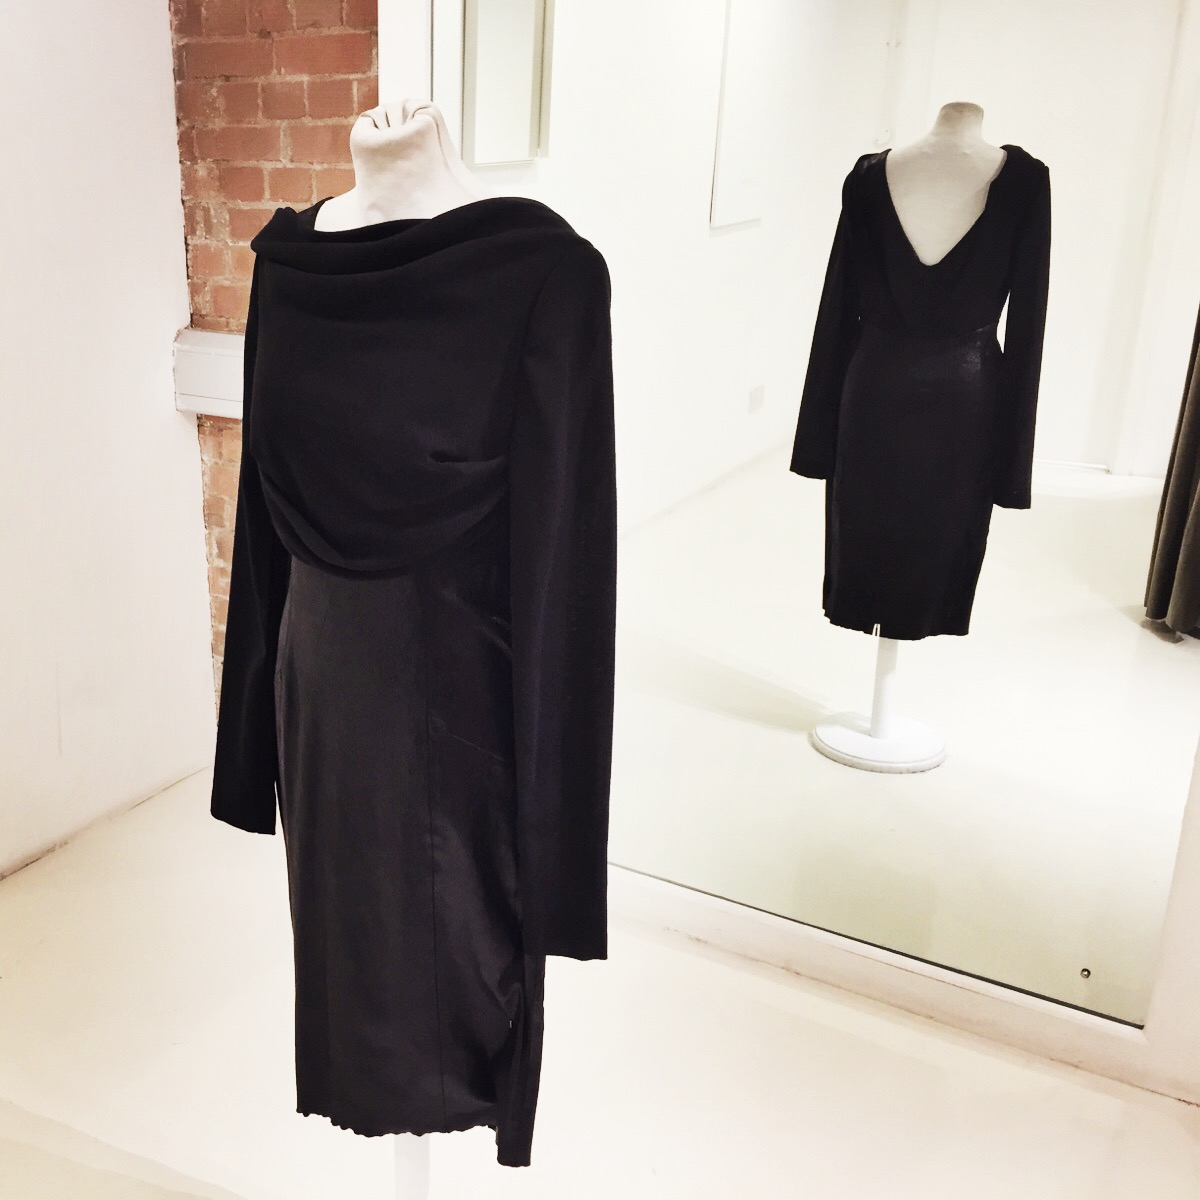 Leather Winter Dress